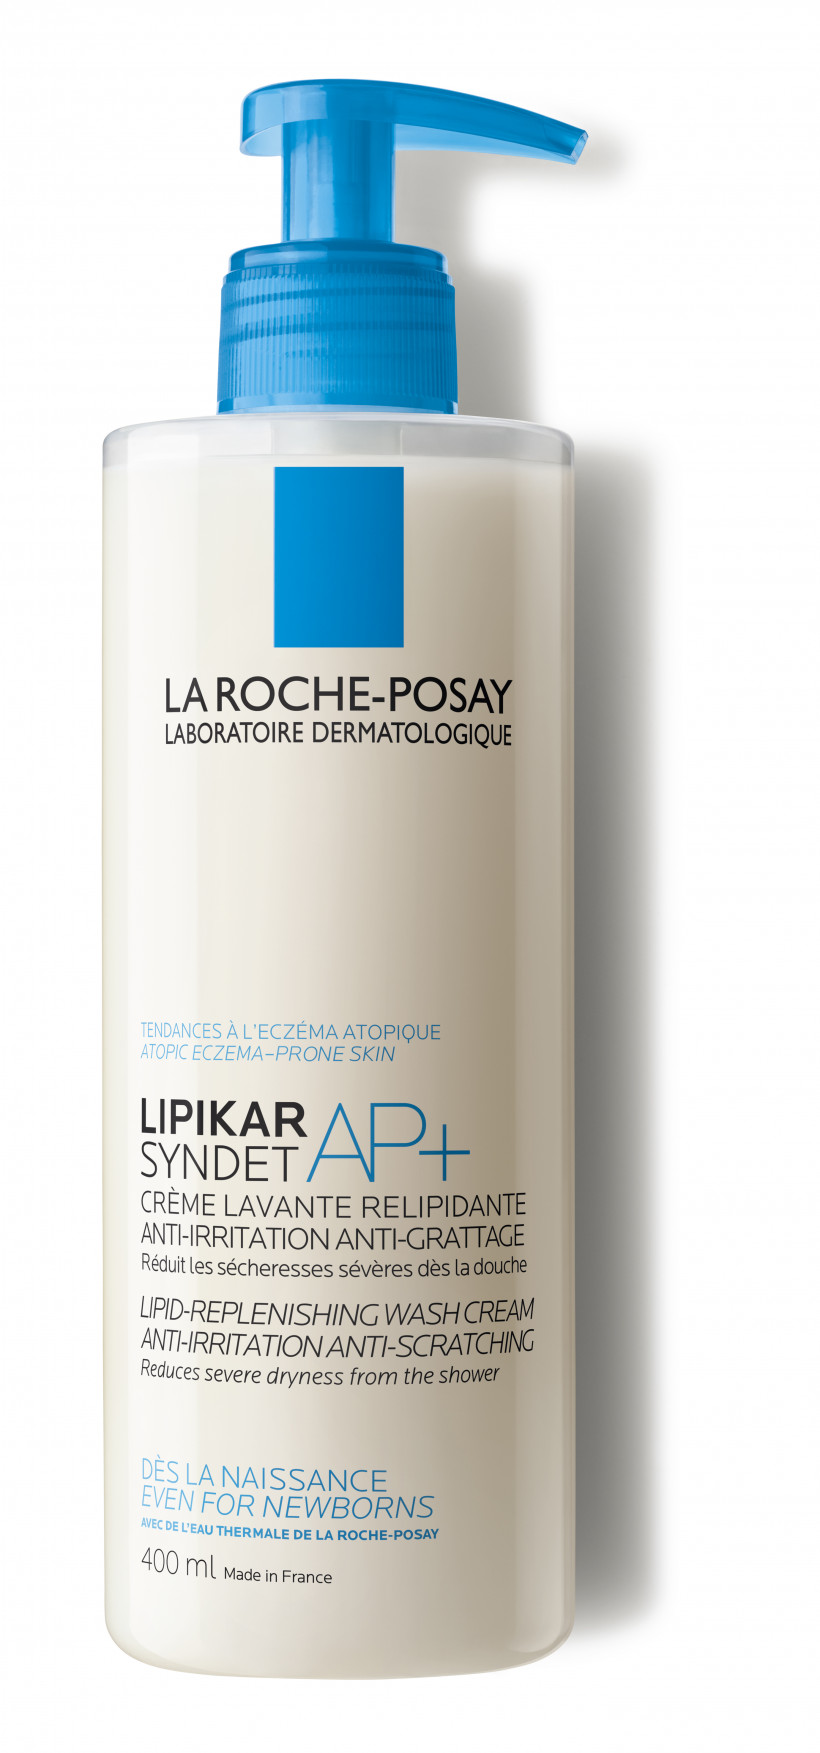 www.laroche-posay.ua/products-treatments/Lipikar/Lipikar-%d1%81%d0%b8%d0%bd%d0%b4%d0%b5%d1%82-%d0%90%d0%9f-p22062.aspx